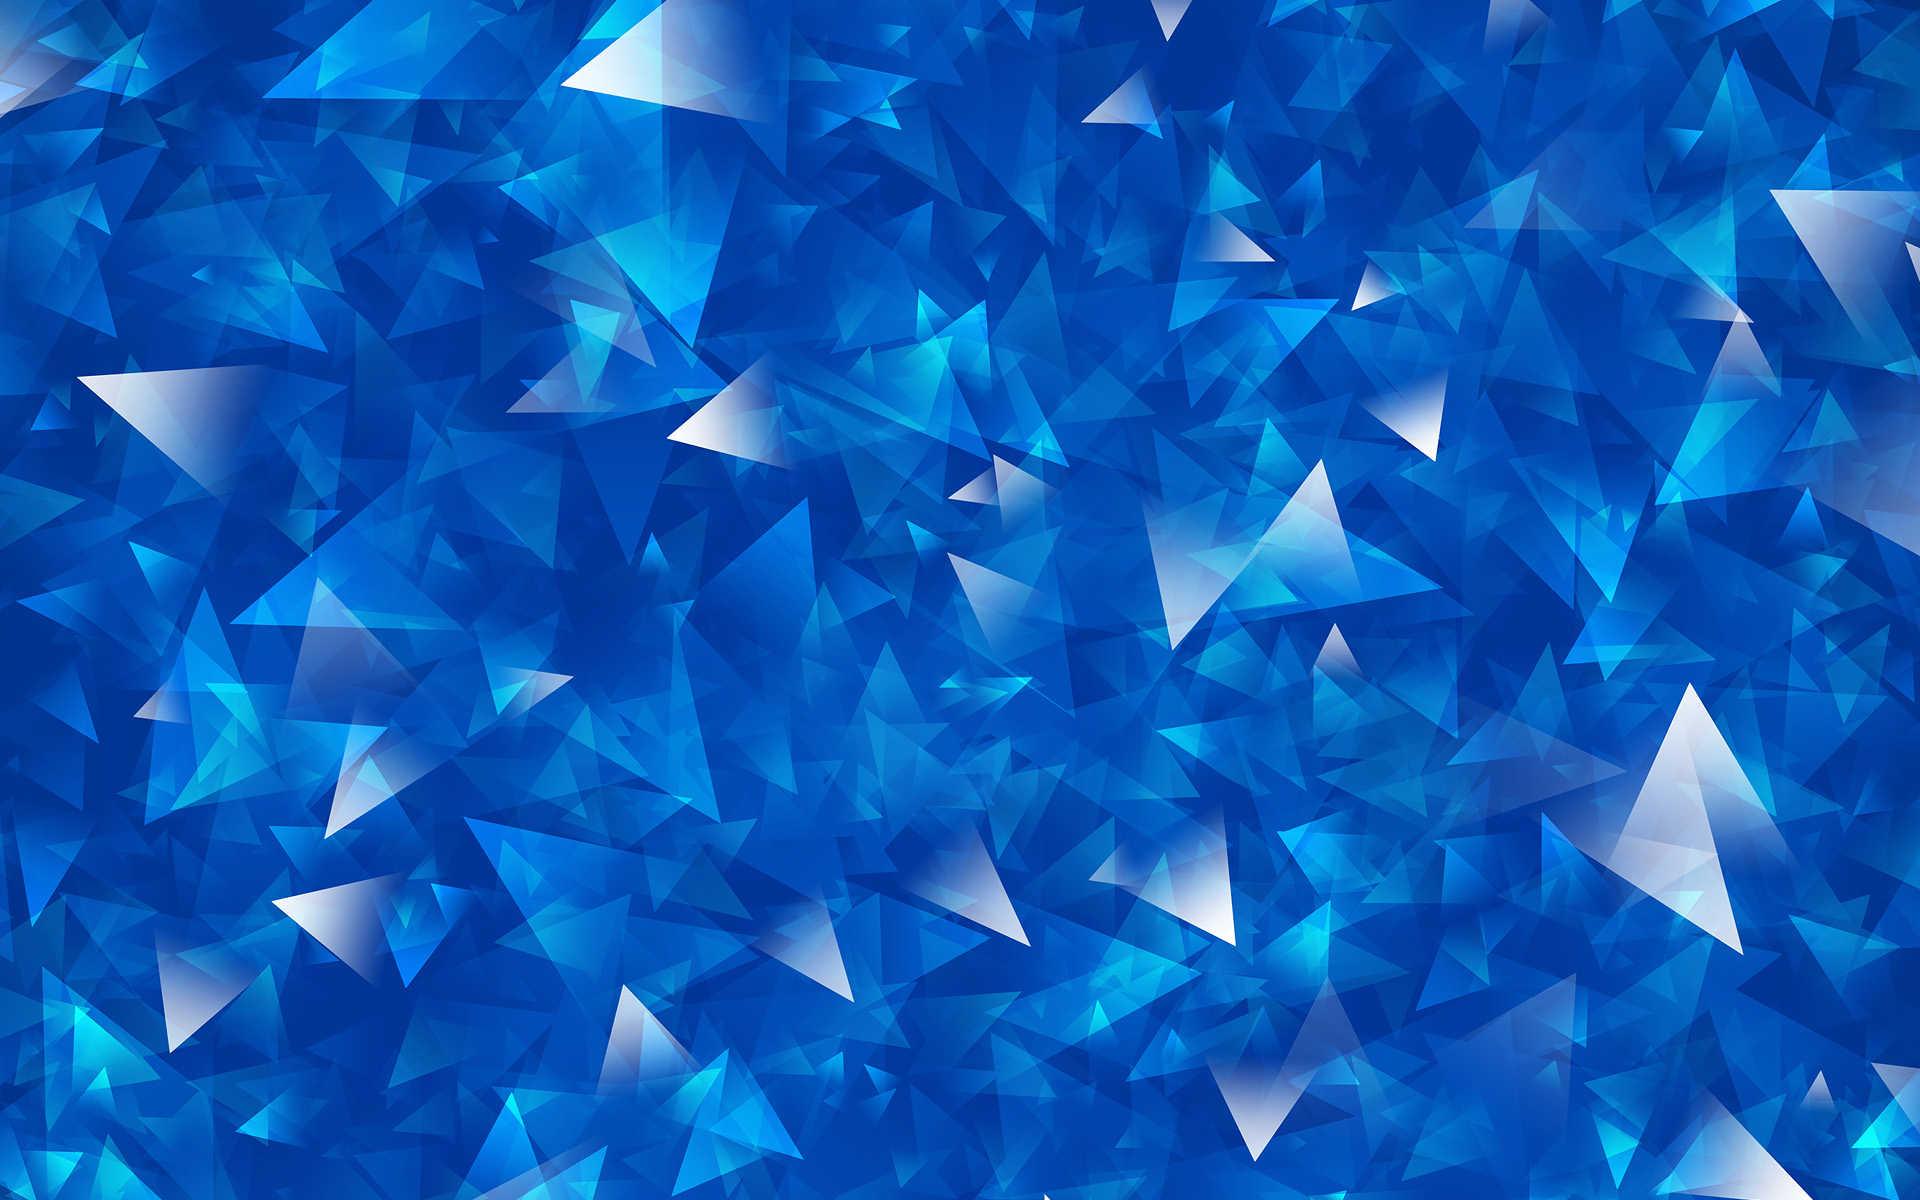 blue hd crystal image